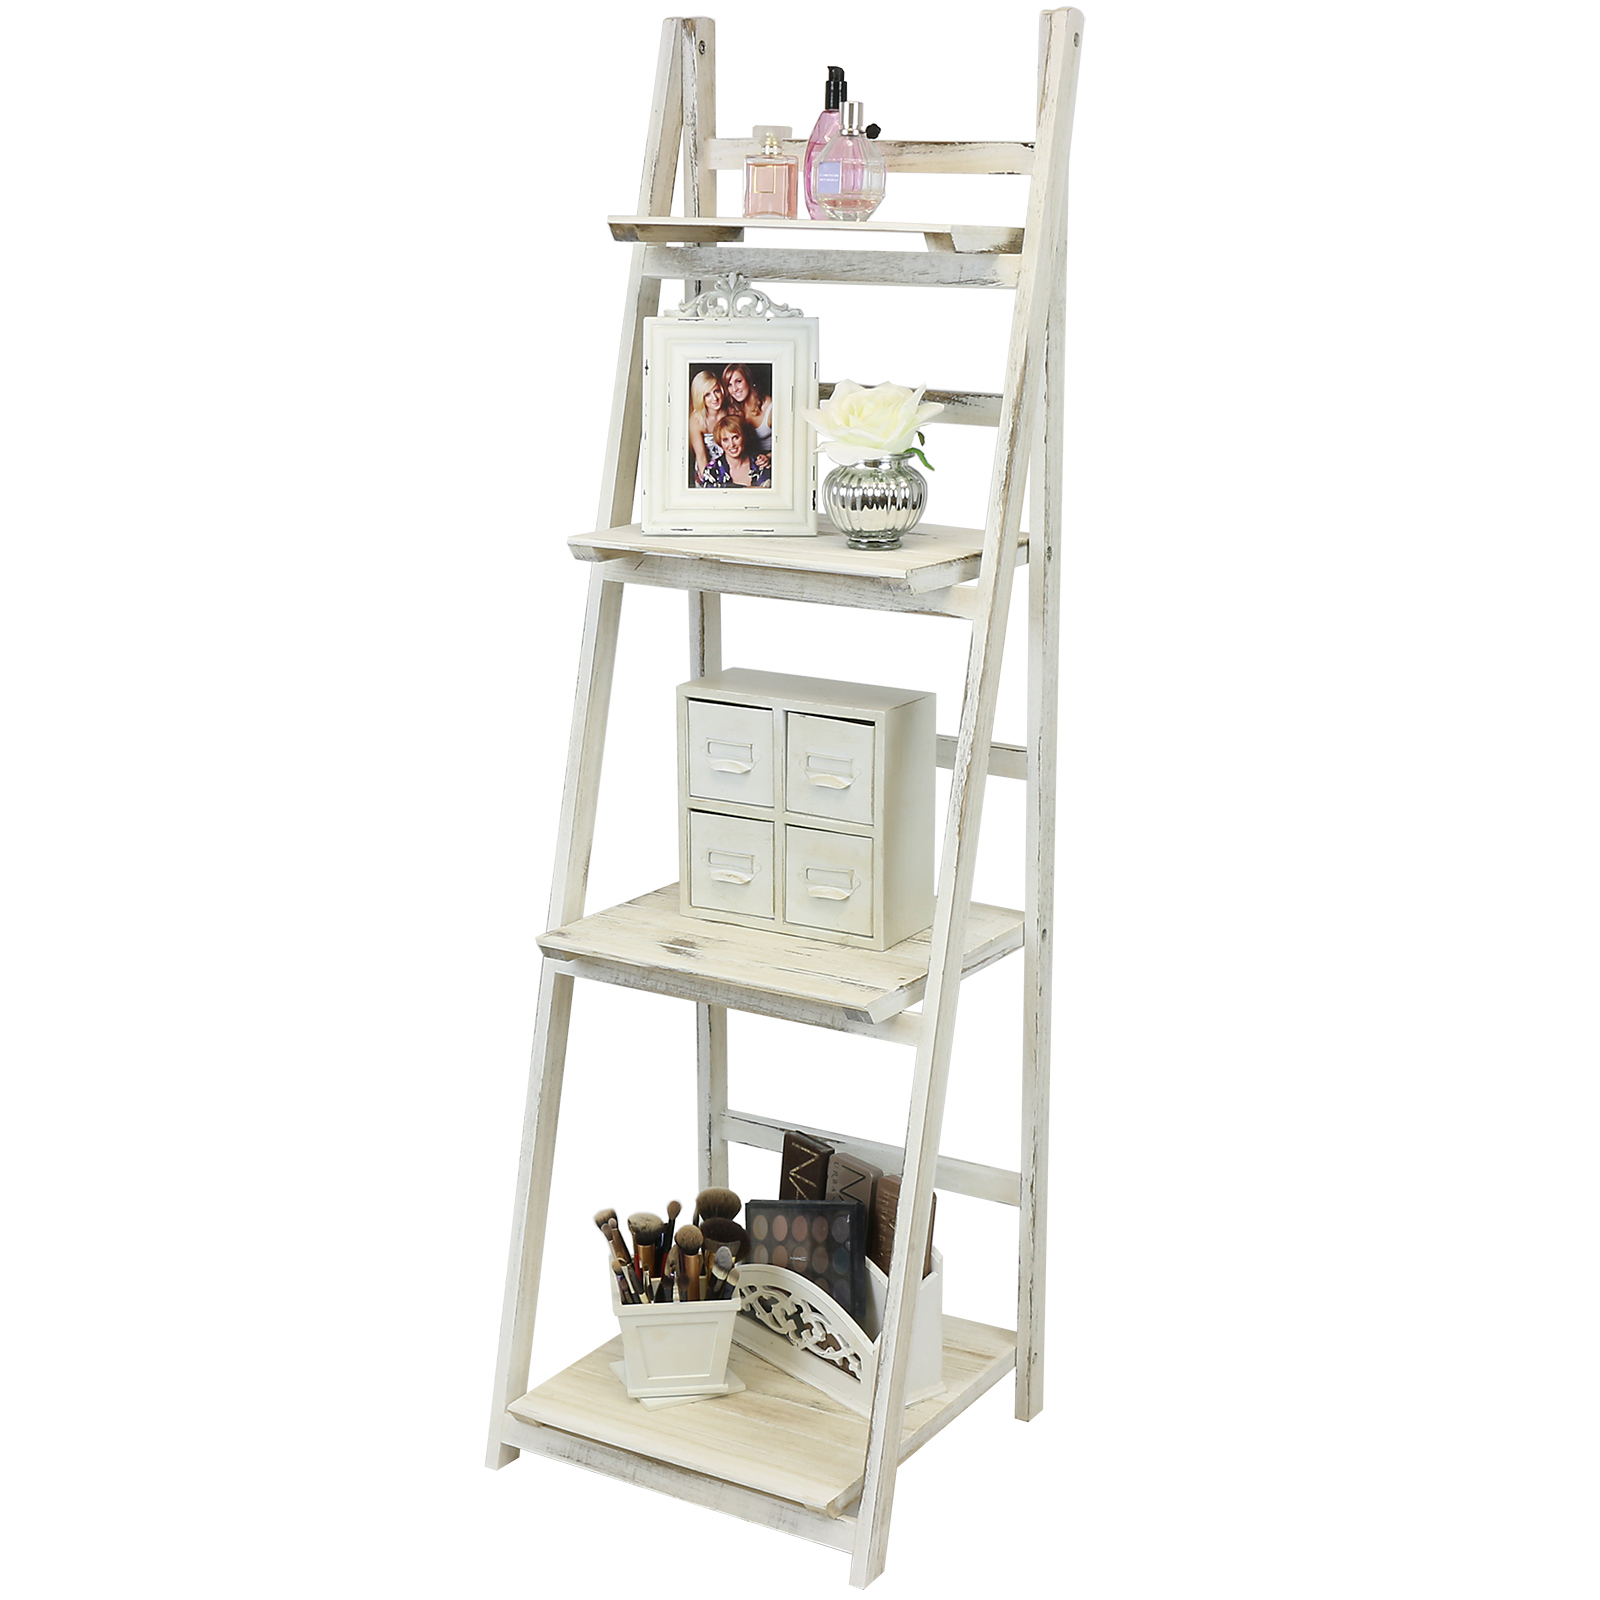 Hartleys White 4 Tier Folding Ladder Storage Home Display